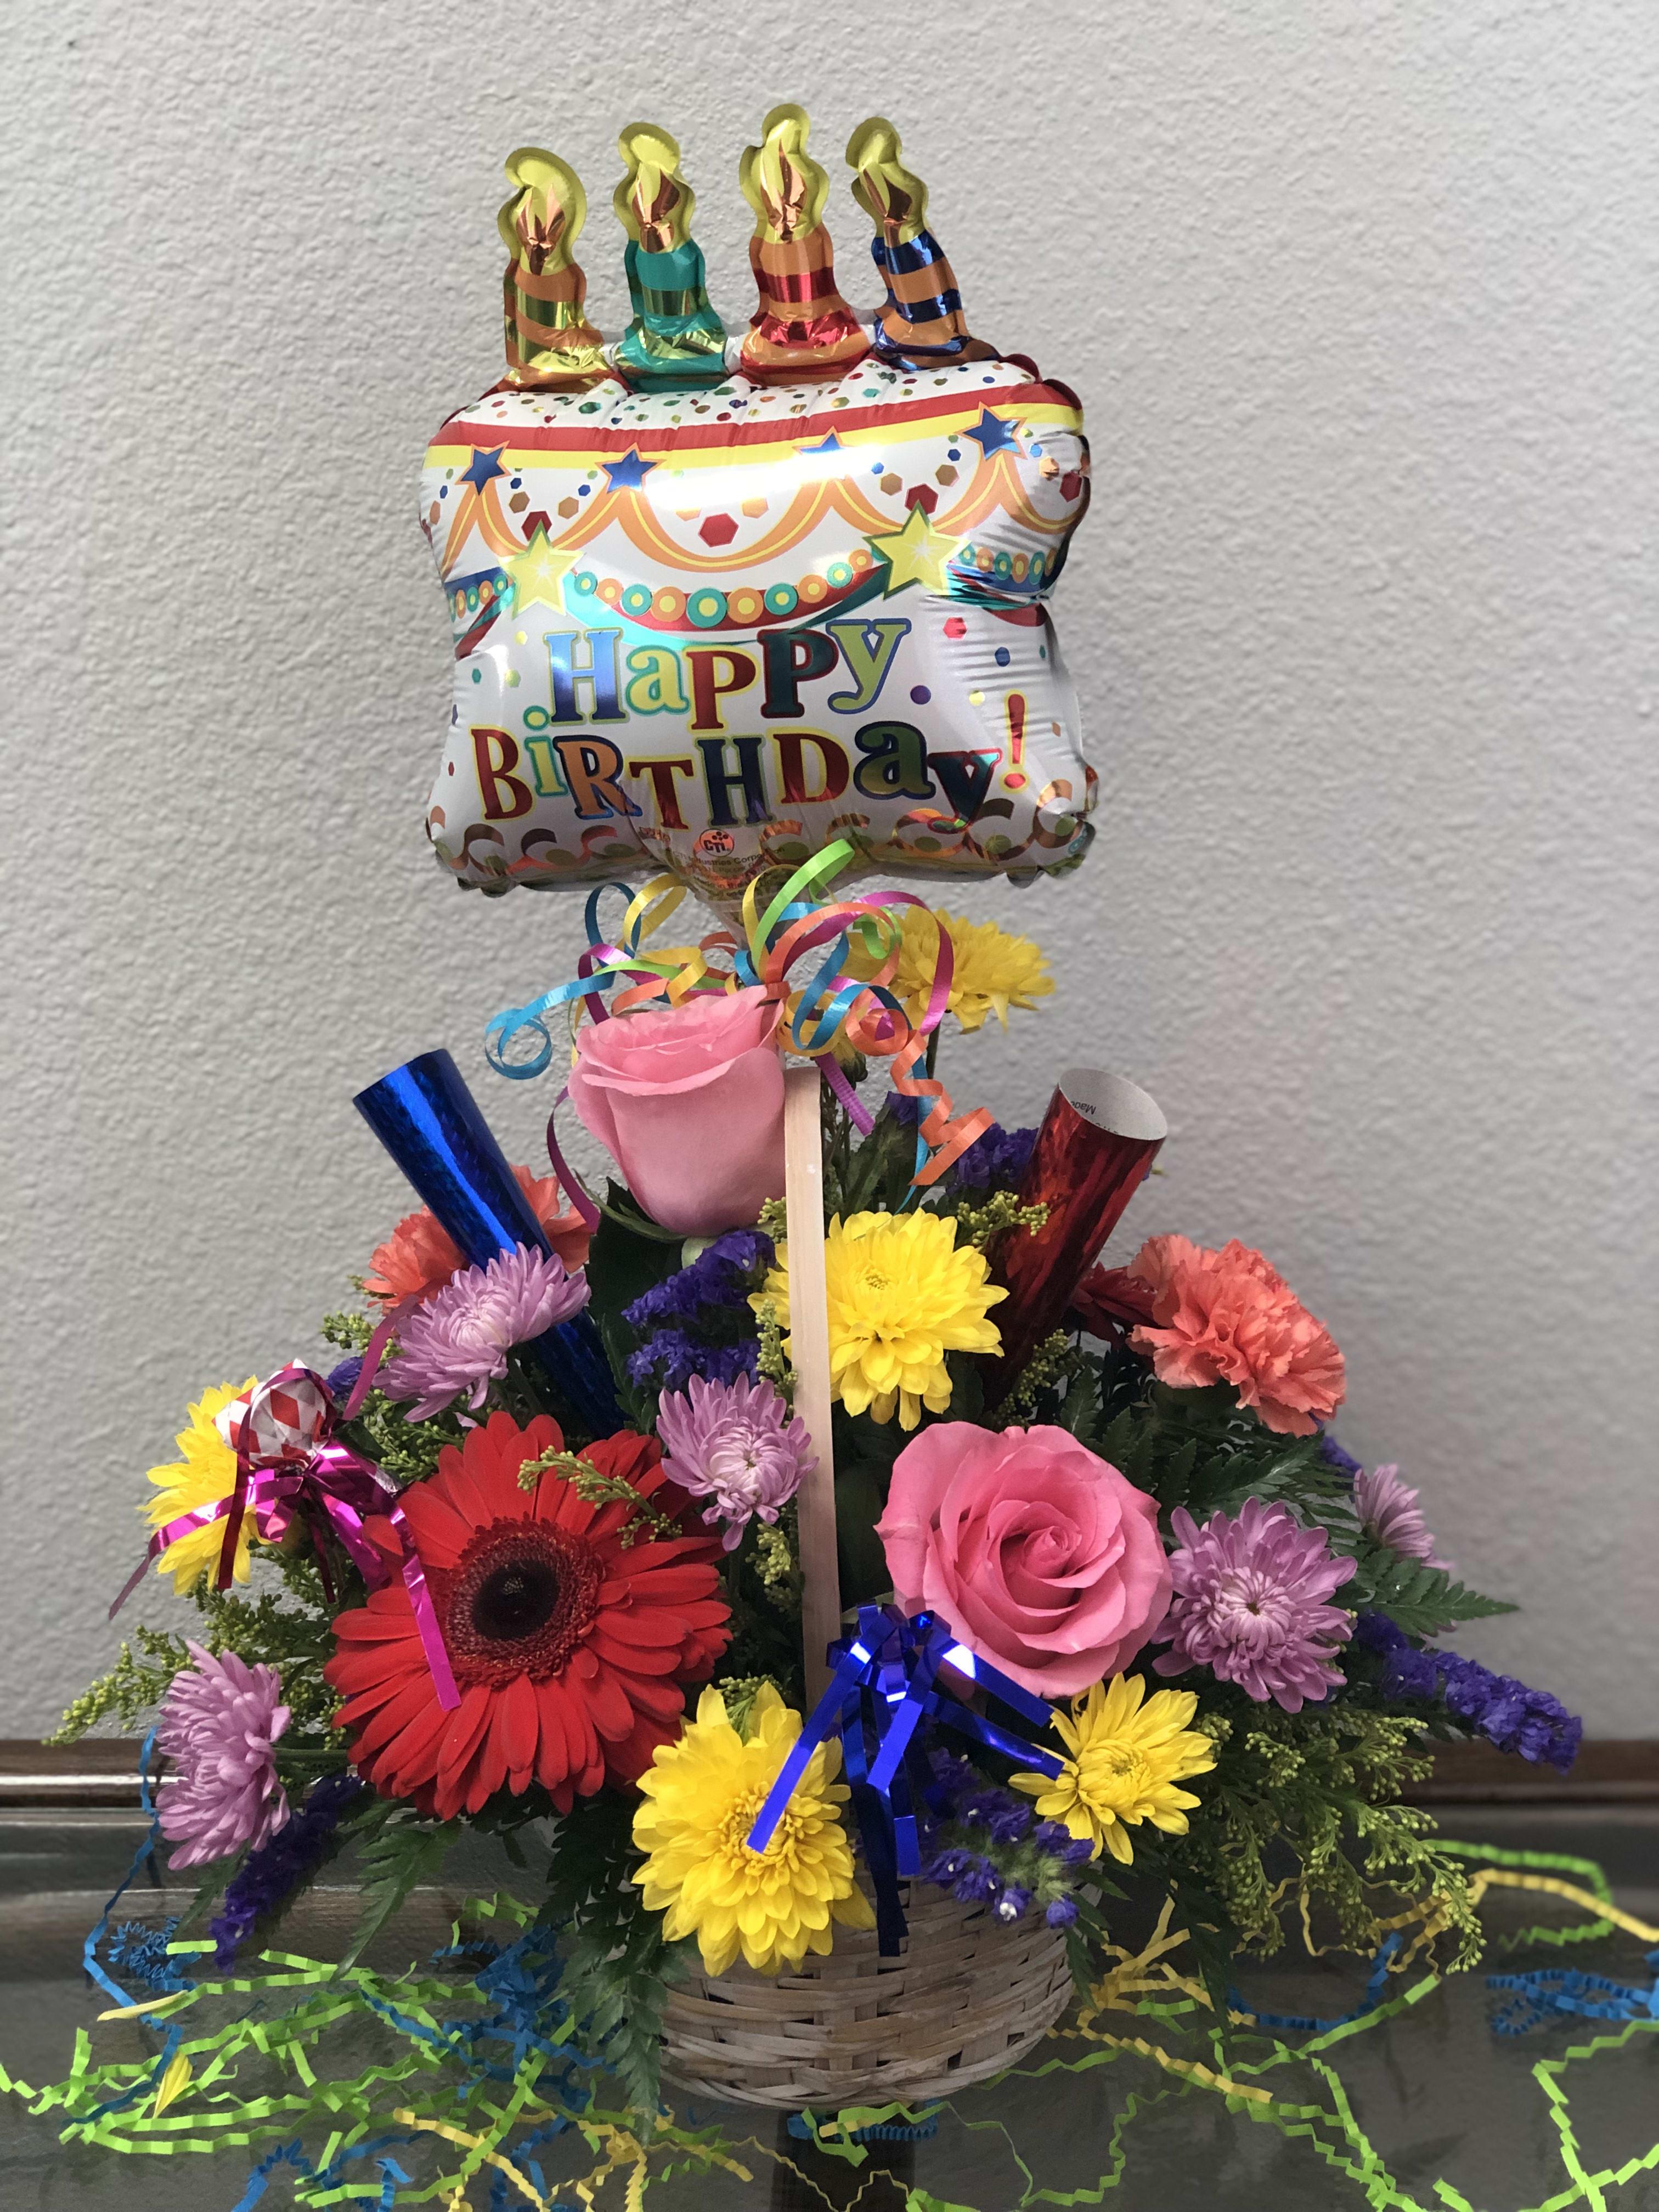 Birthday Bash Bouquet in SAN ANTONIO, TX | The Last Straw Florist